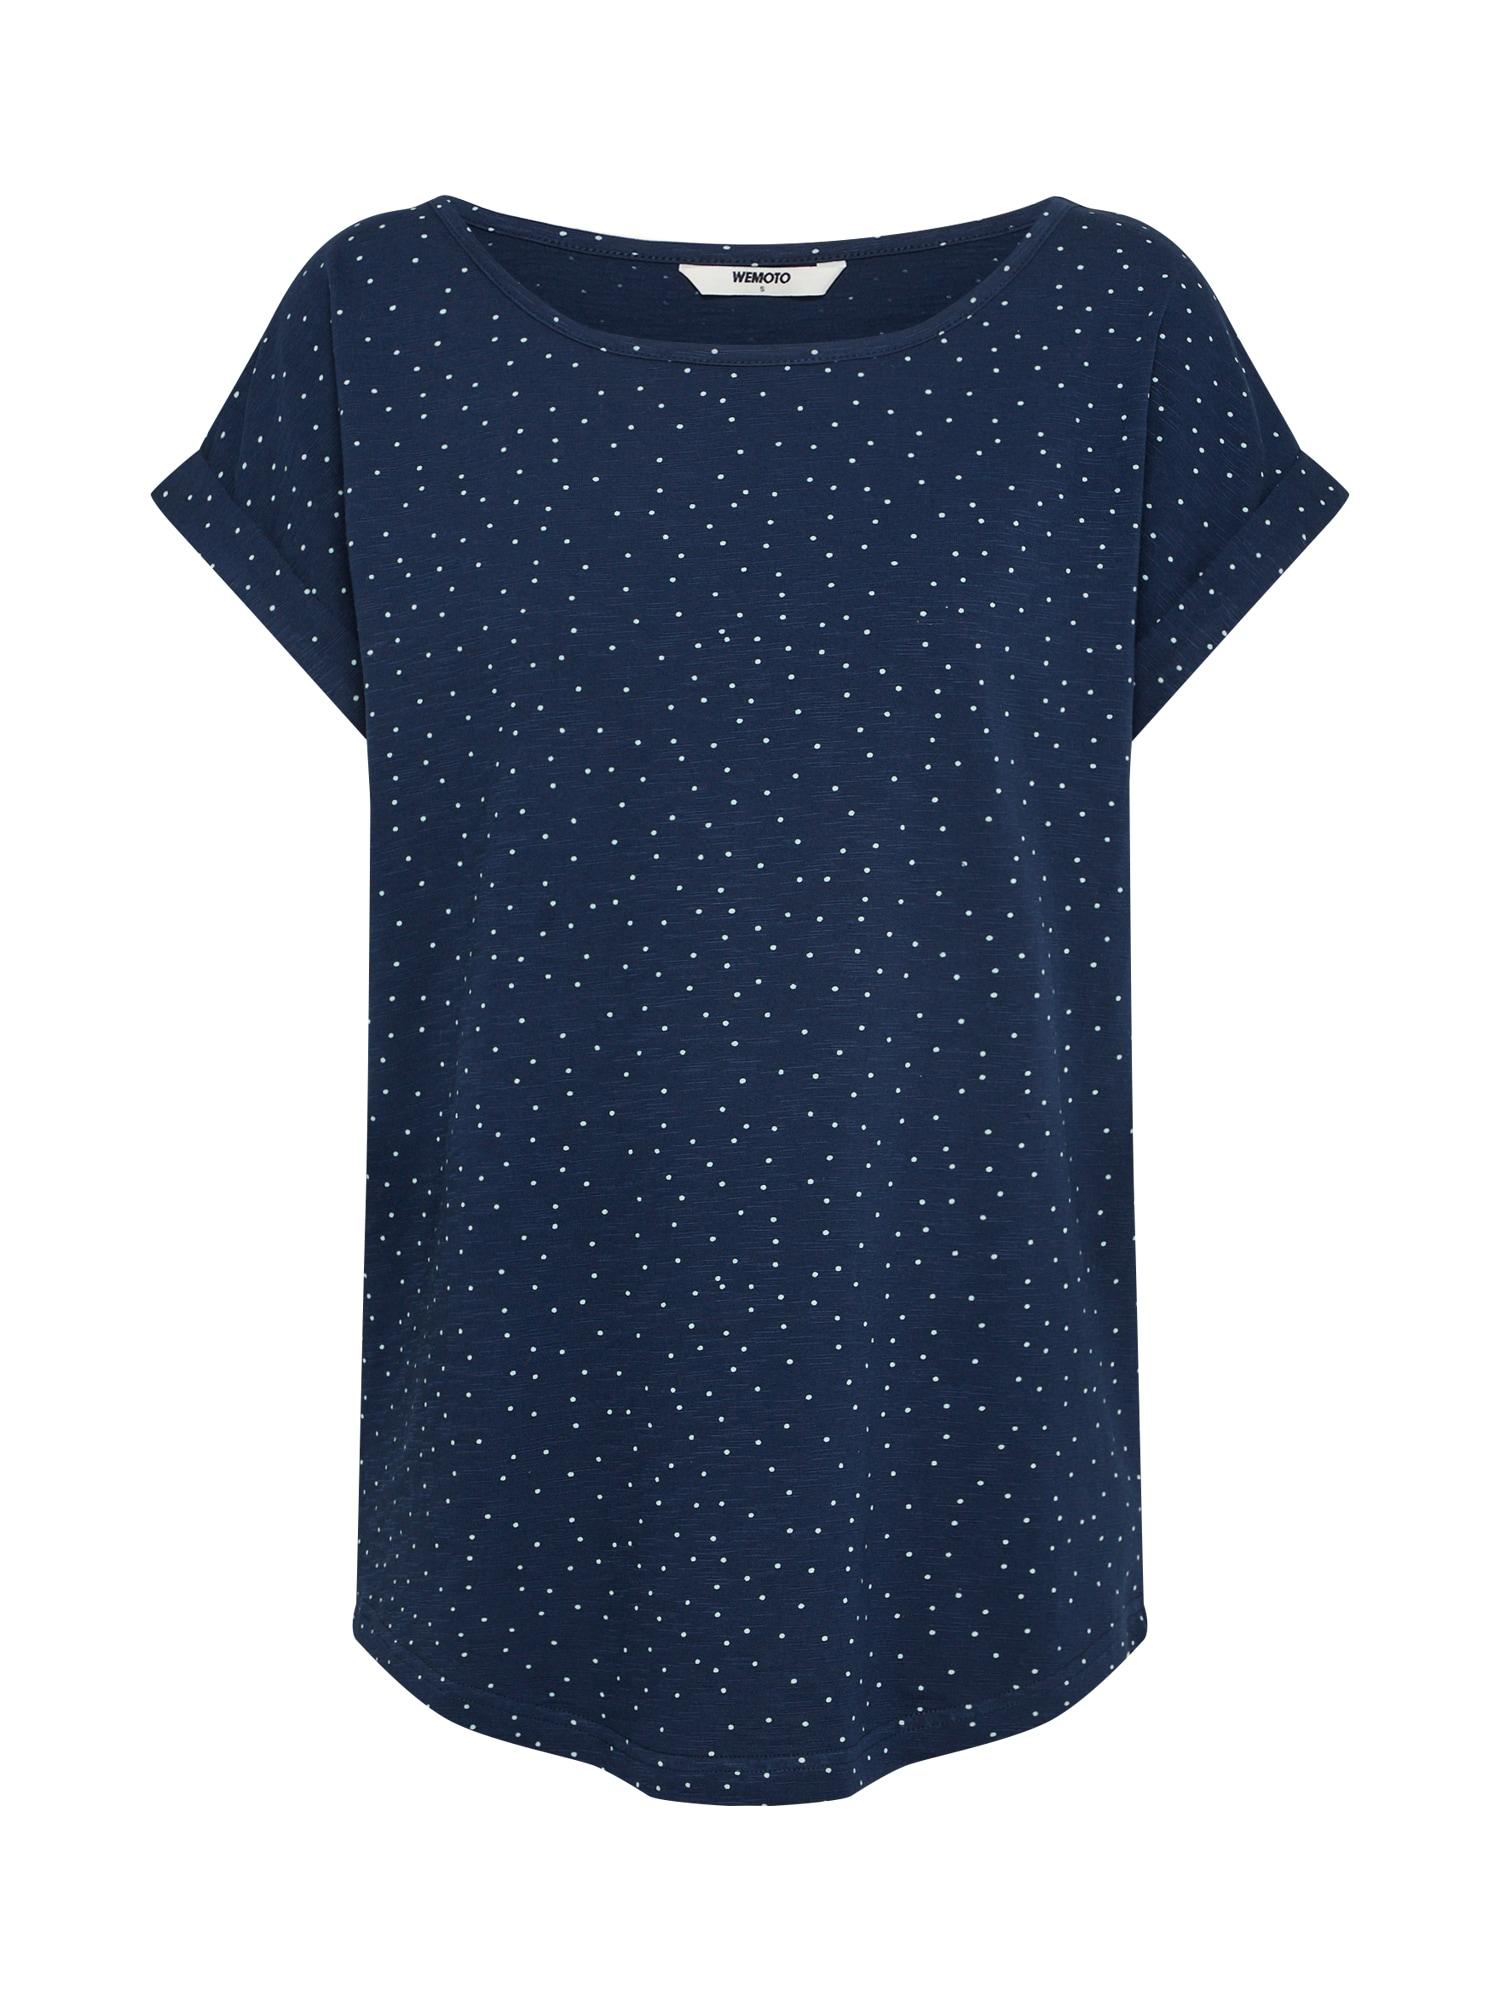 Tričko námořnická modř bílá Wemoto